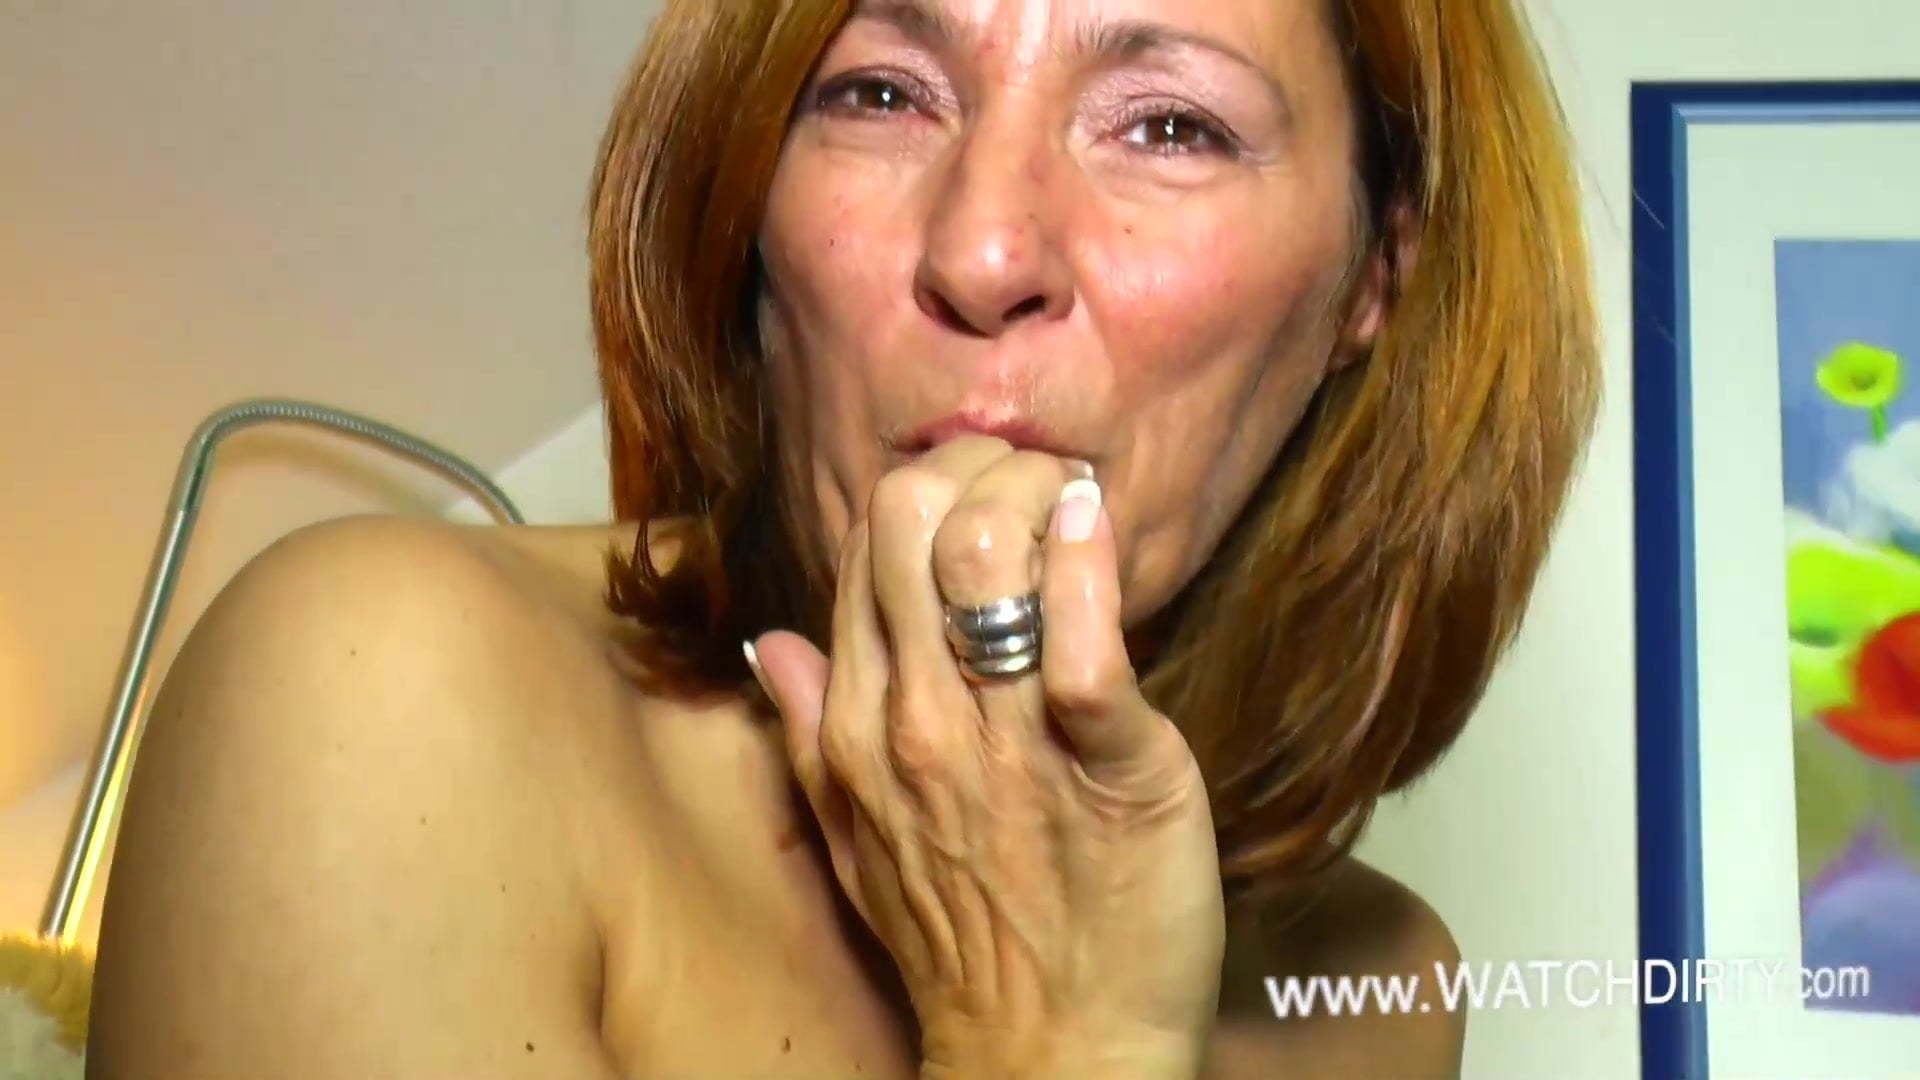 Oma porno sextreme hd net Geile Oma Hat Sextreff Free Slutload Mobile Hd Porn Ba Xhamster